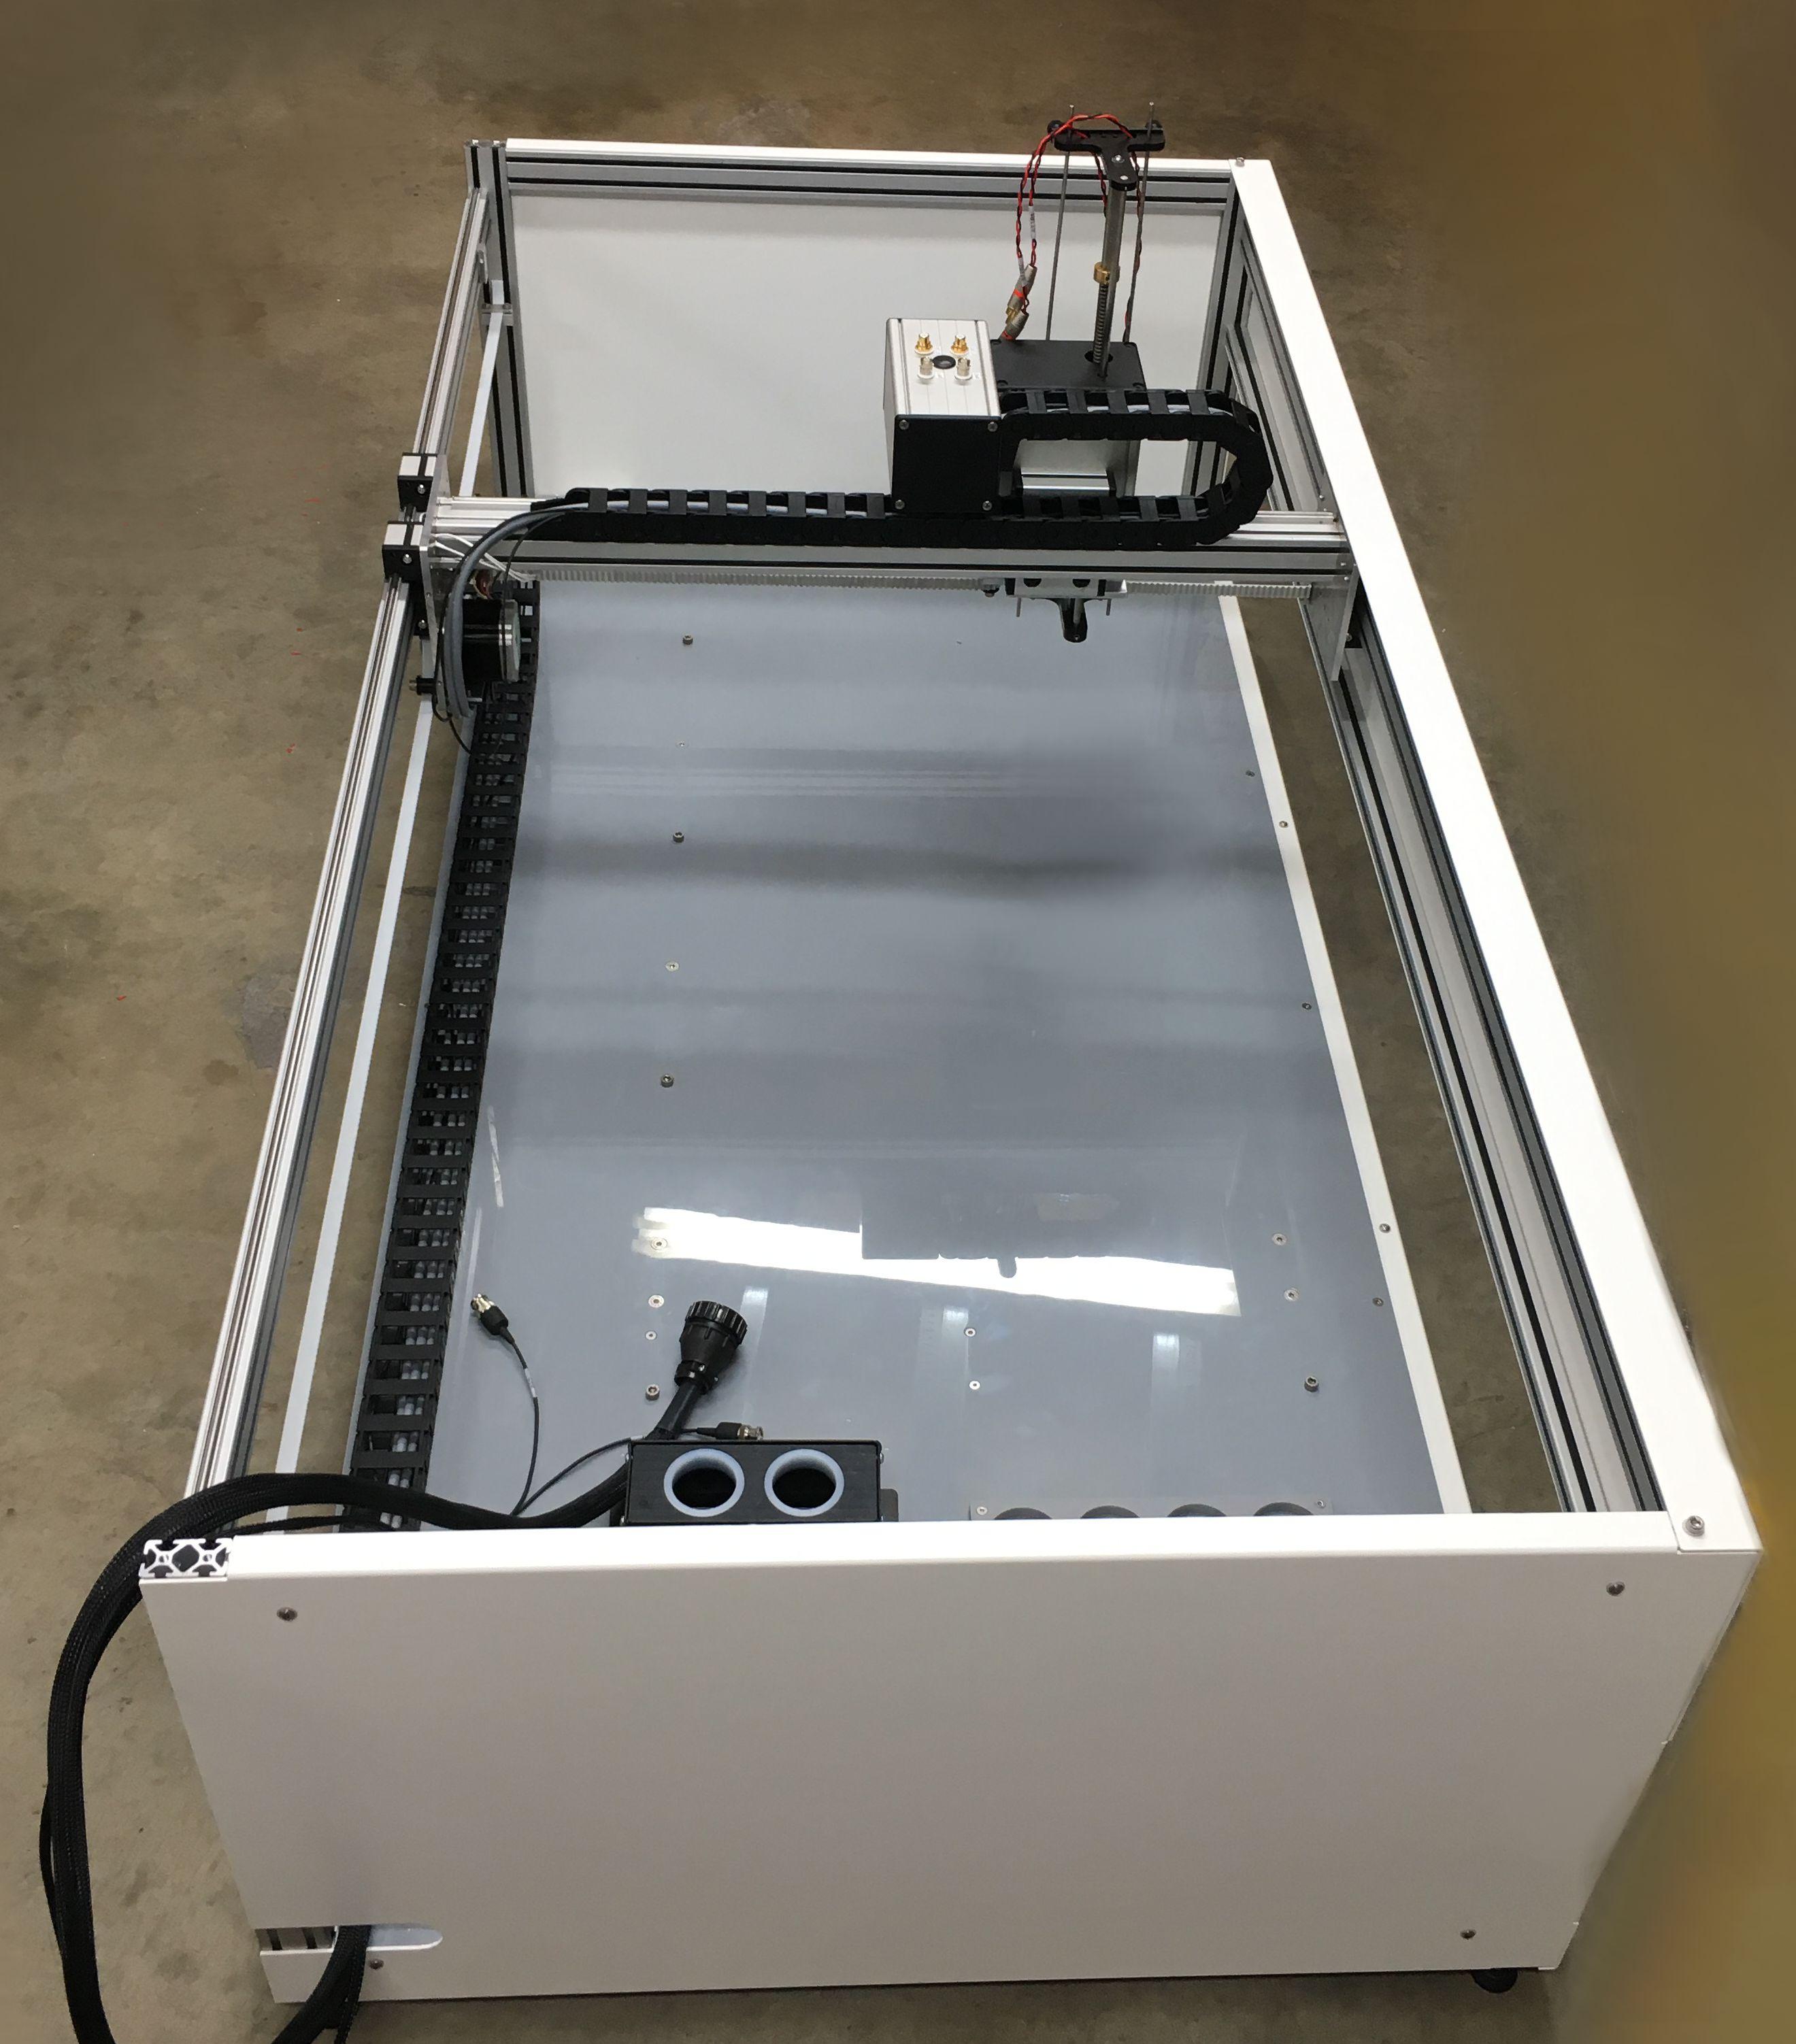 PVC used in Lab Equipment